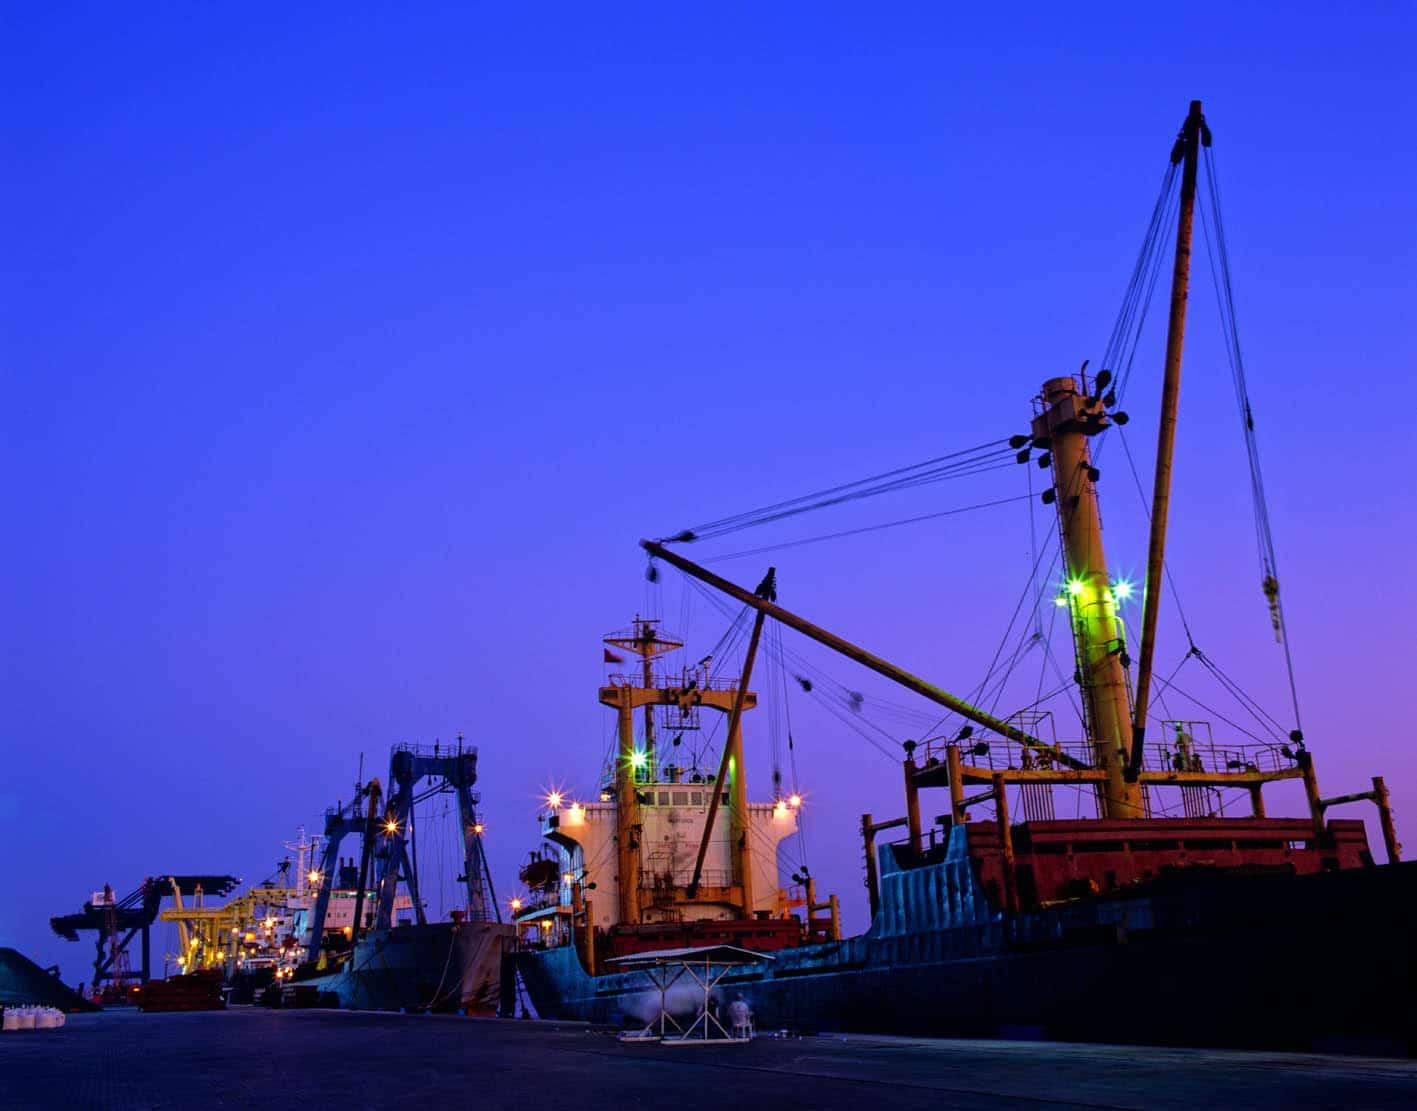 ميناء صحار